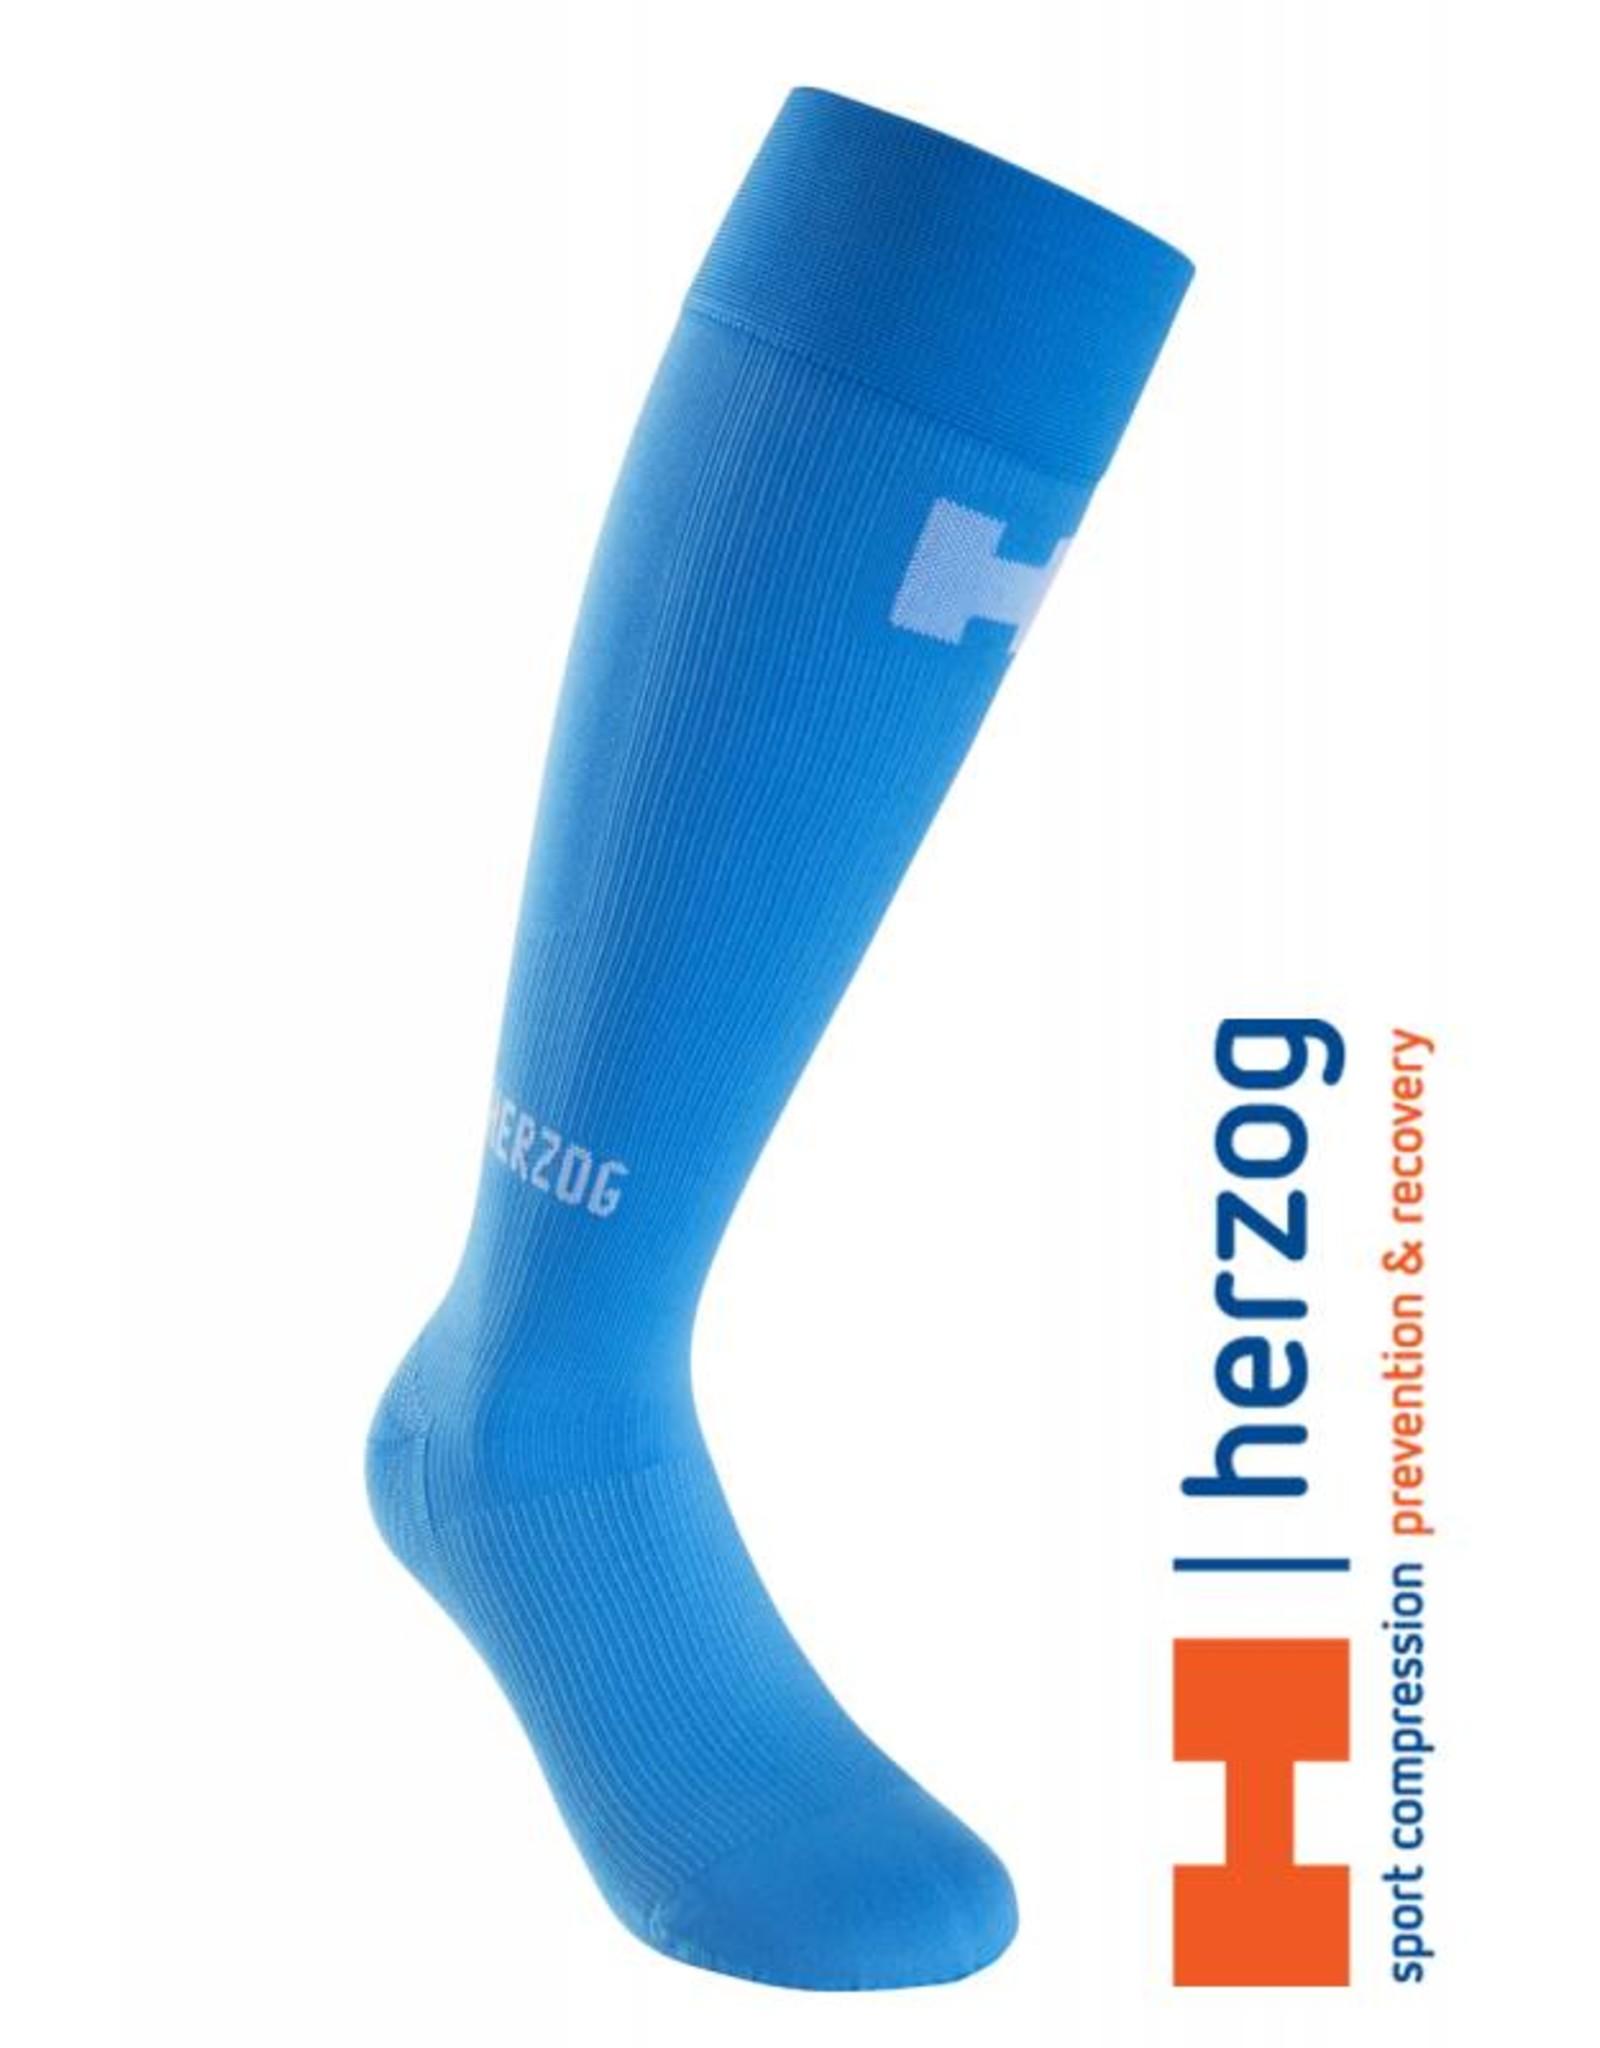 Herzog Sokken,  Pro Compressiekousen Blauw